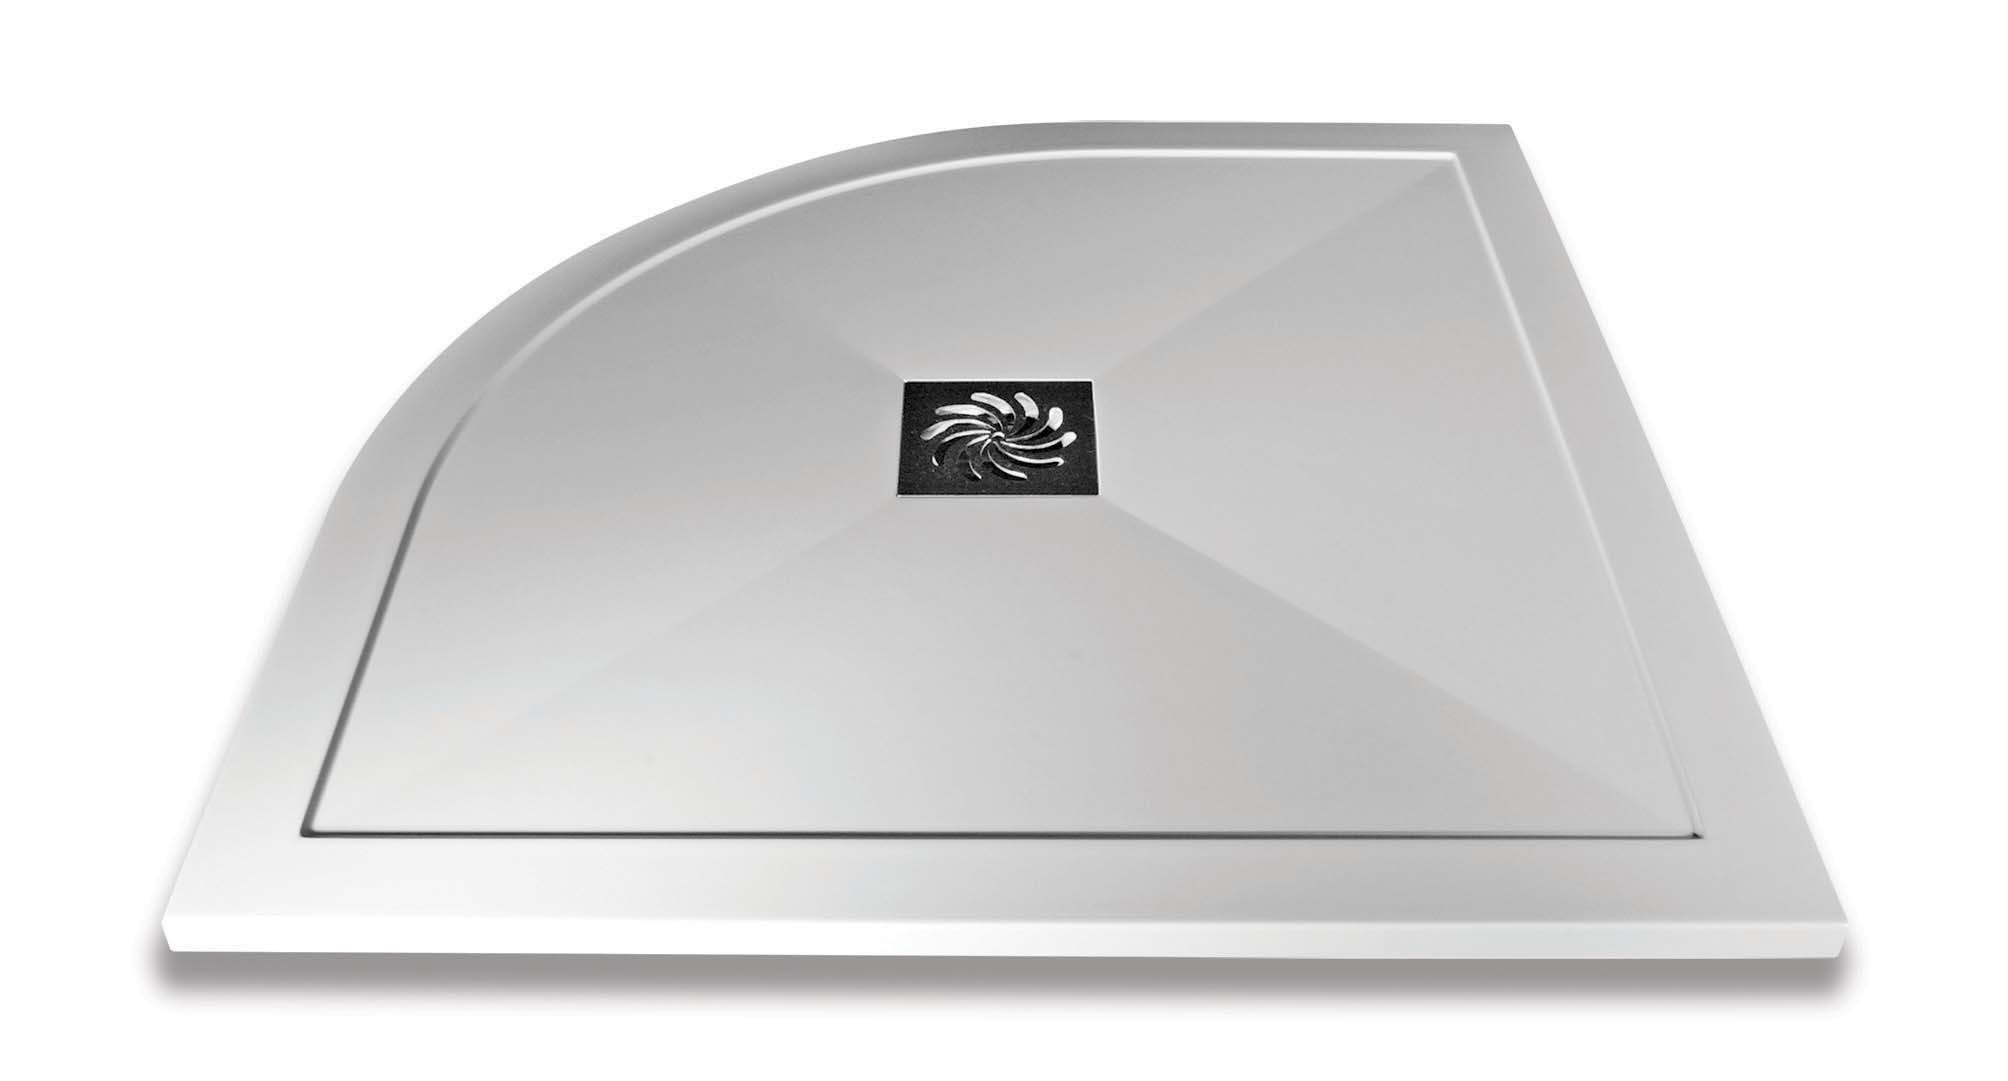 Slimline Quadrant Shower Tray & Waste